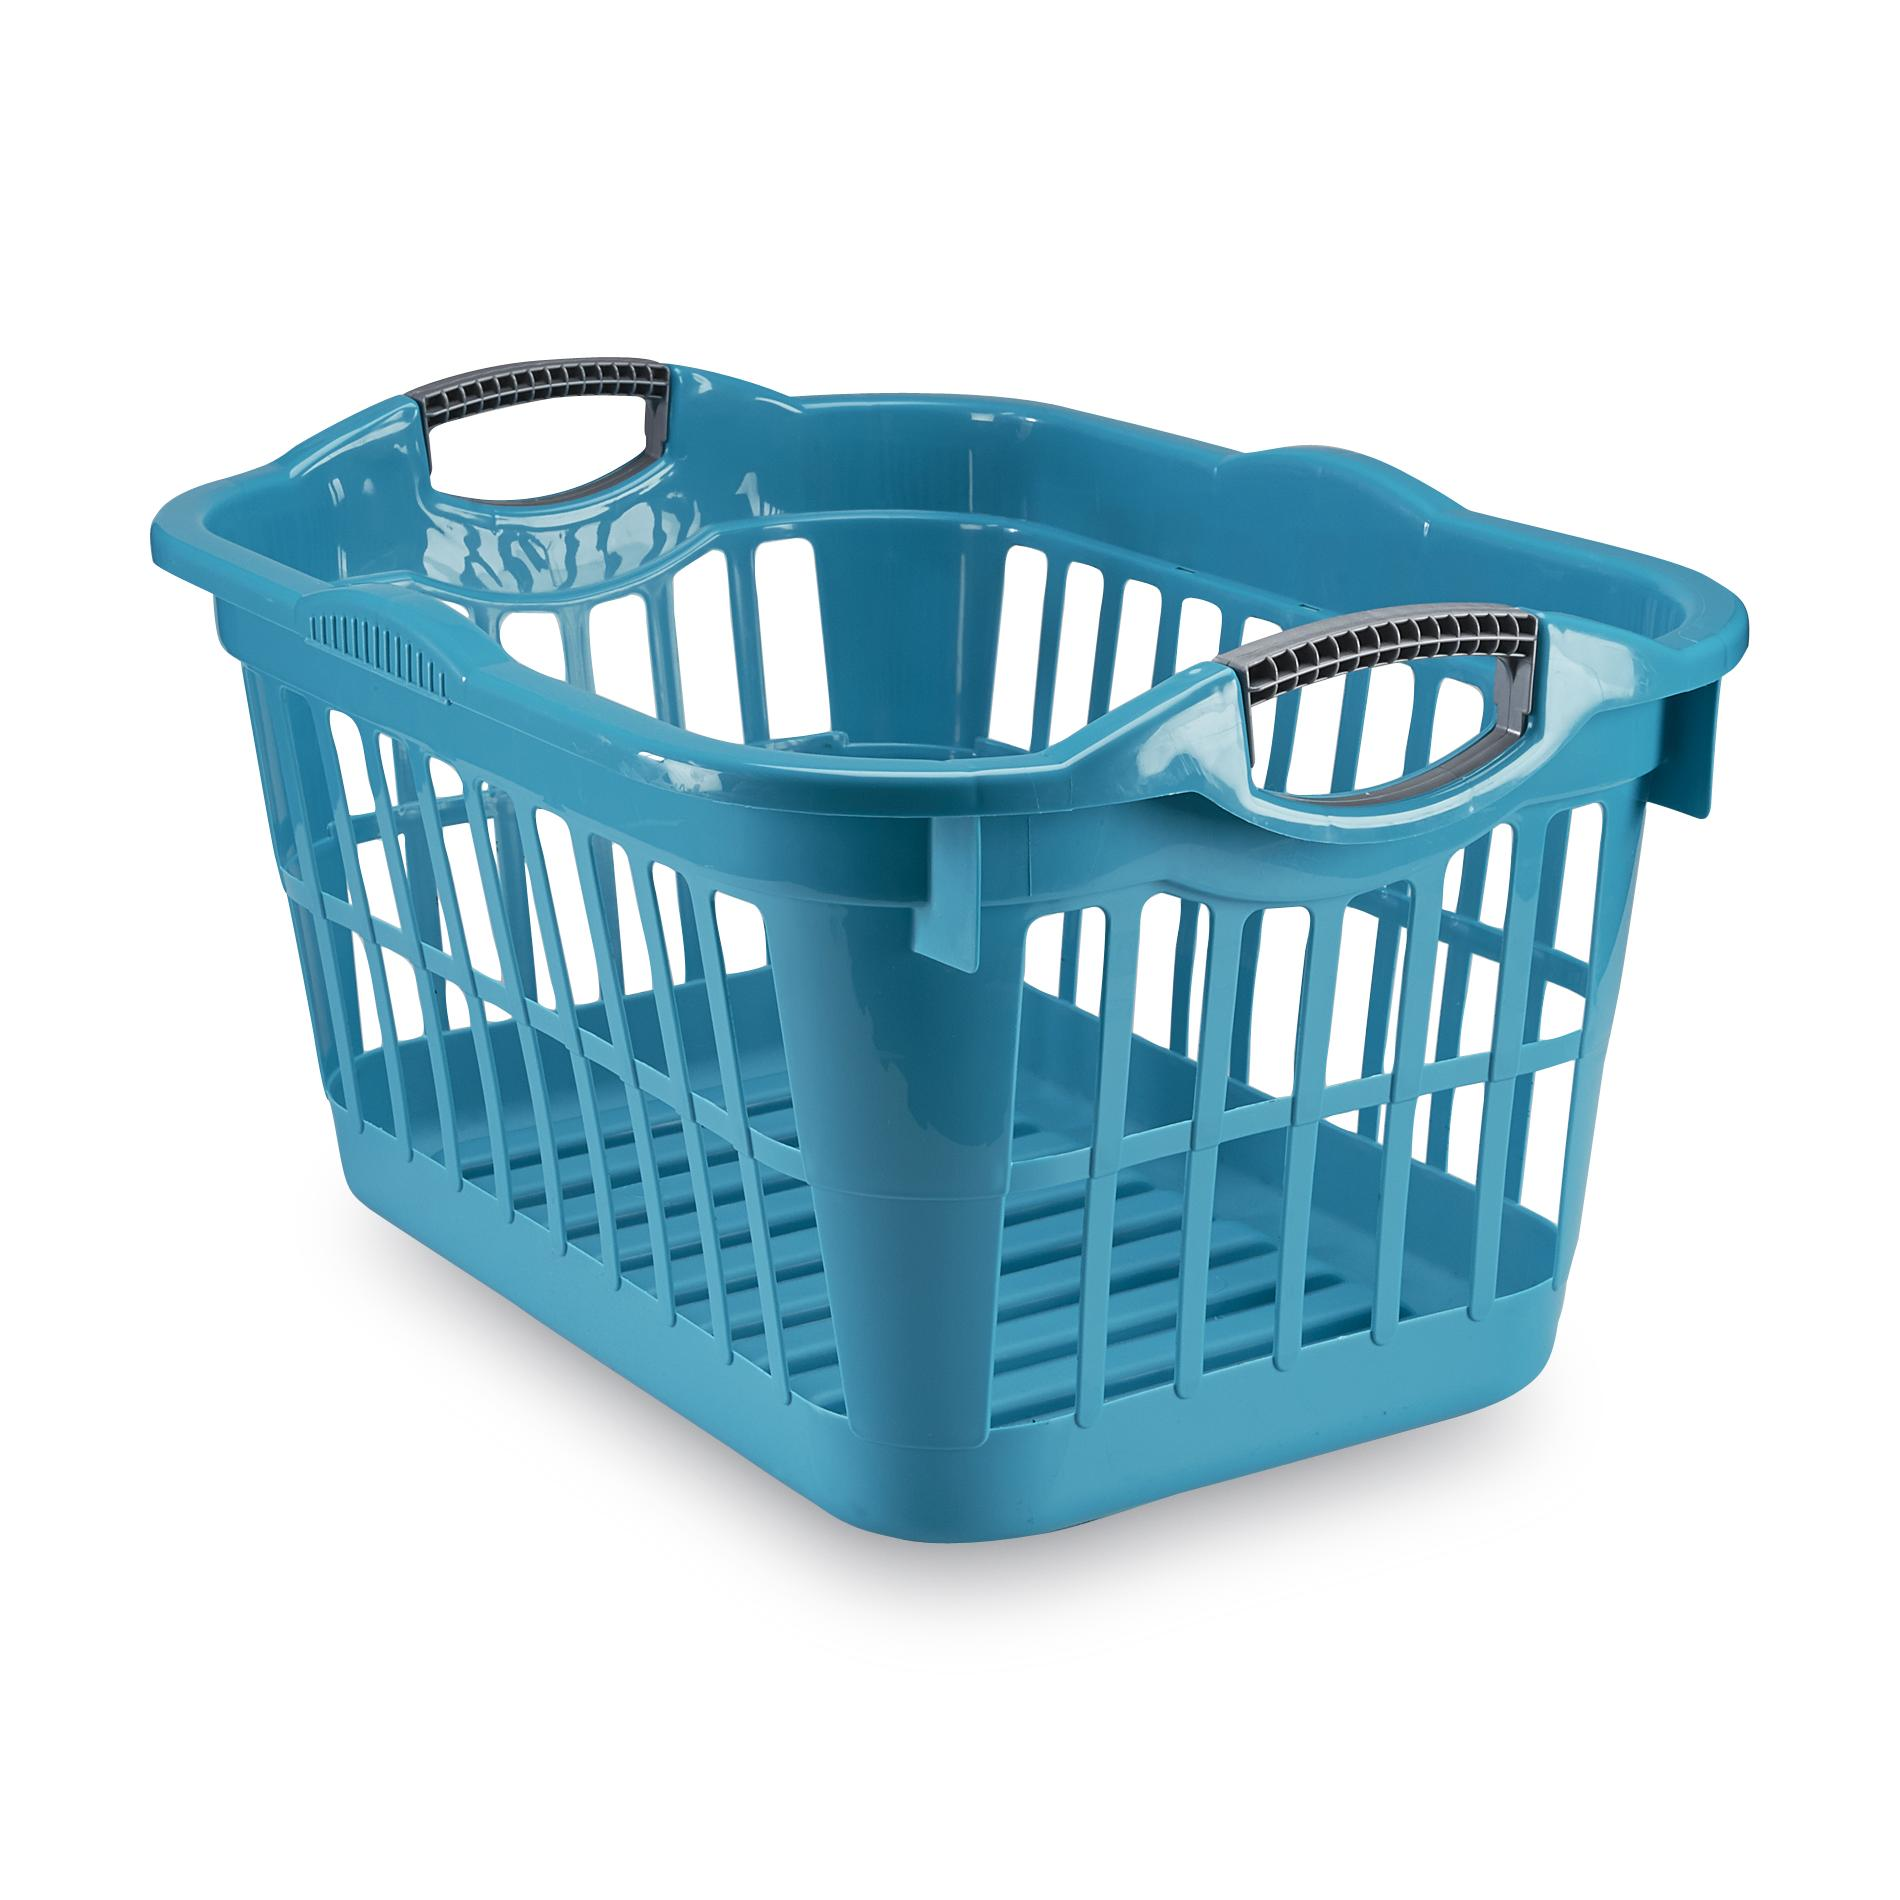 Tamor Corporation Essential Home 2-Bushel Laundry Basket